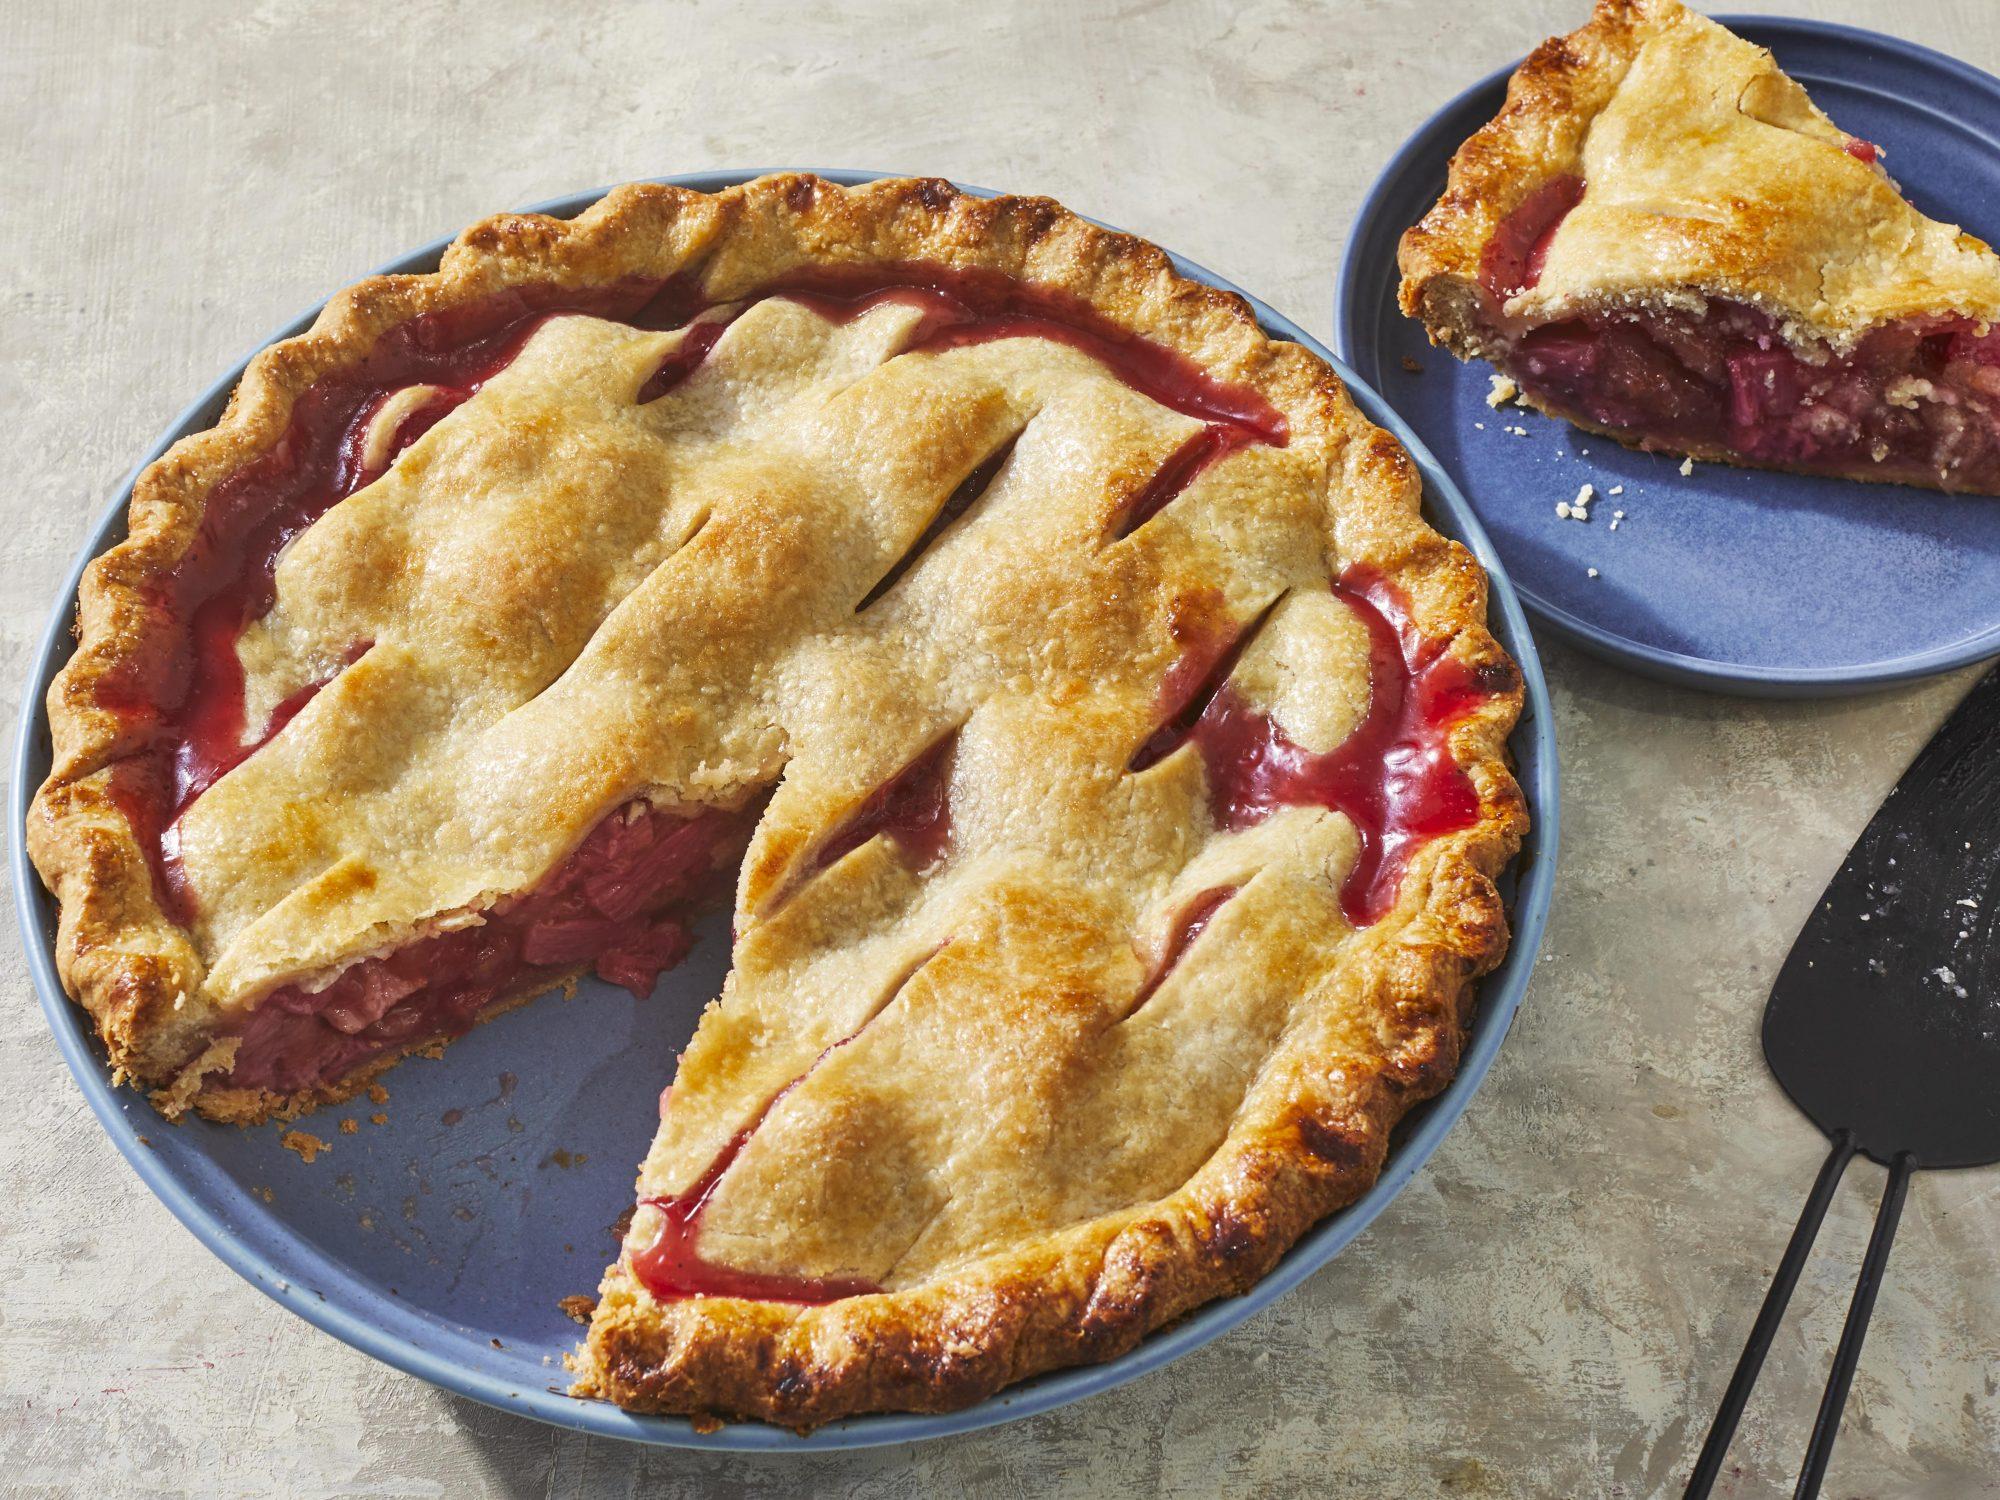 mr - Rhubarb Pie Image